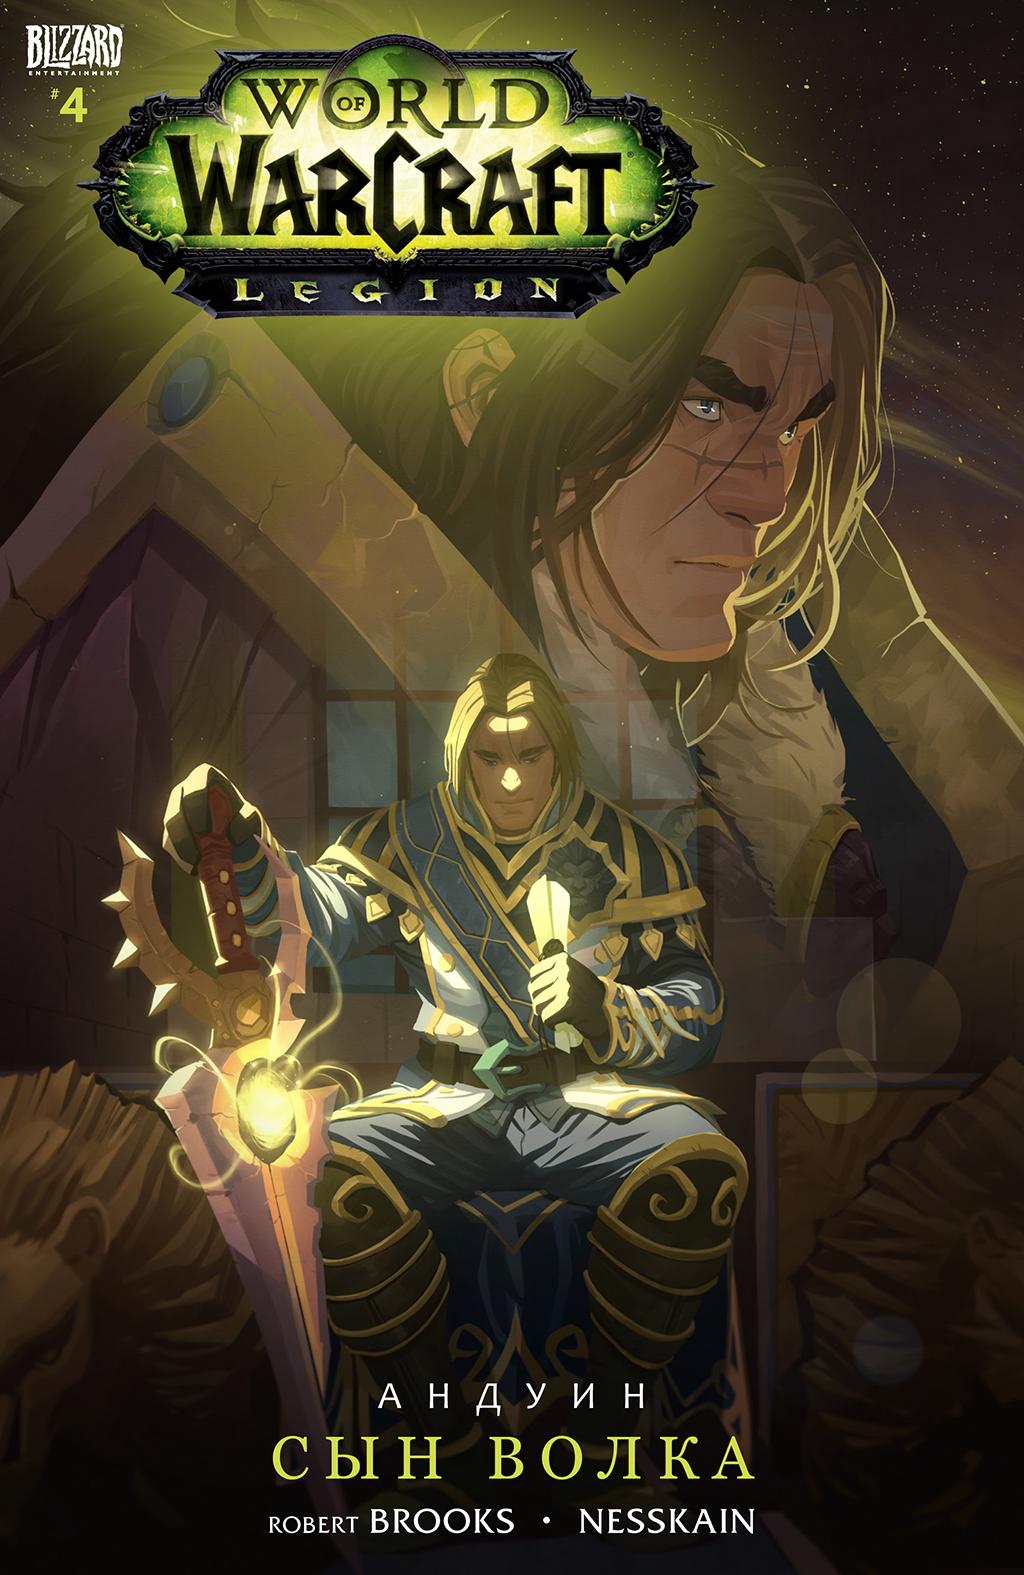 Комикс World of Warcraft: Legion